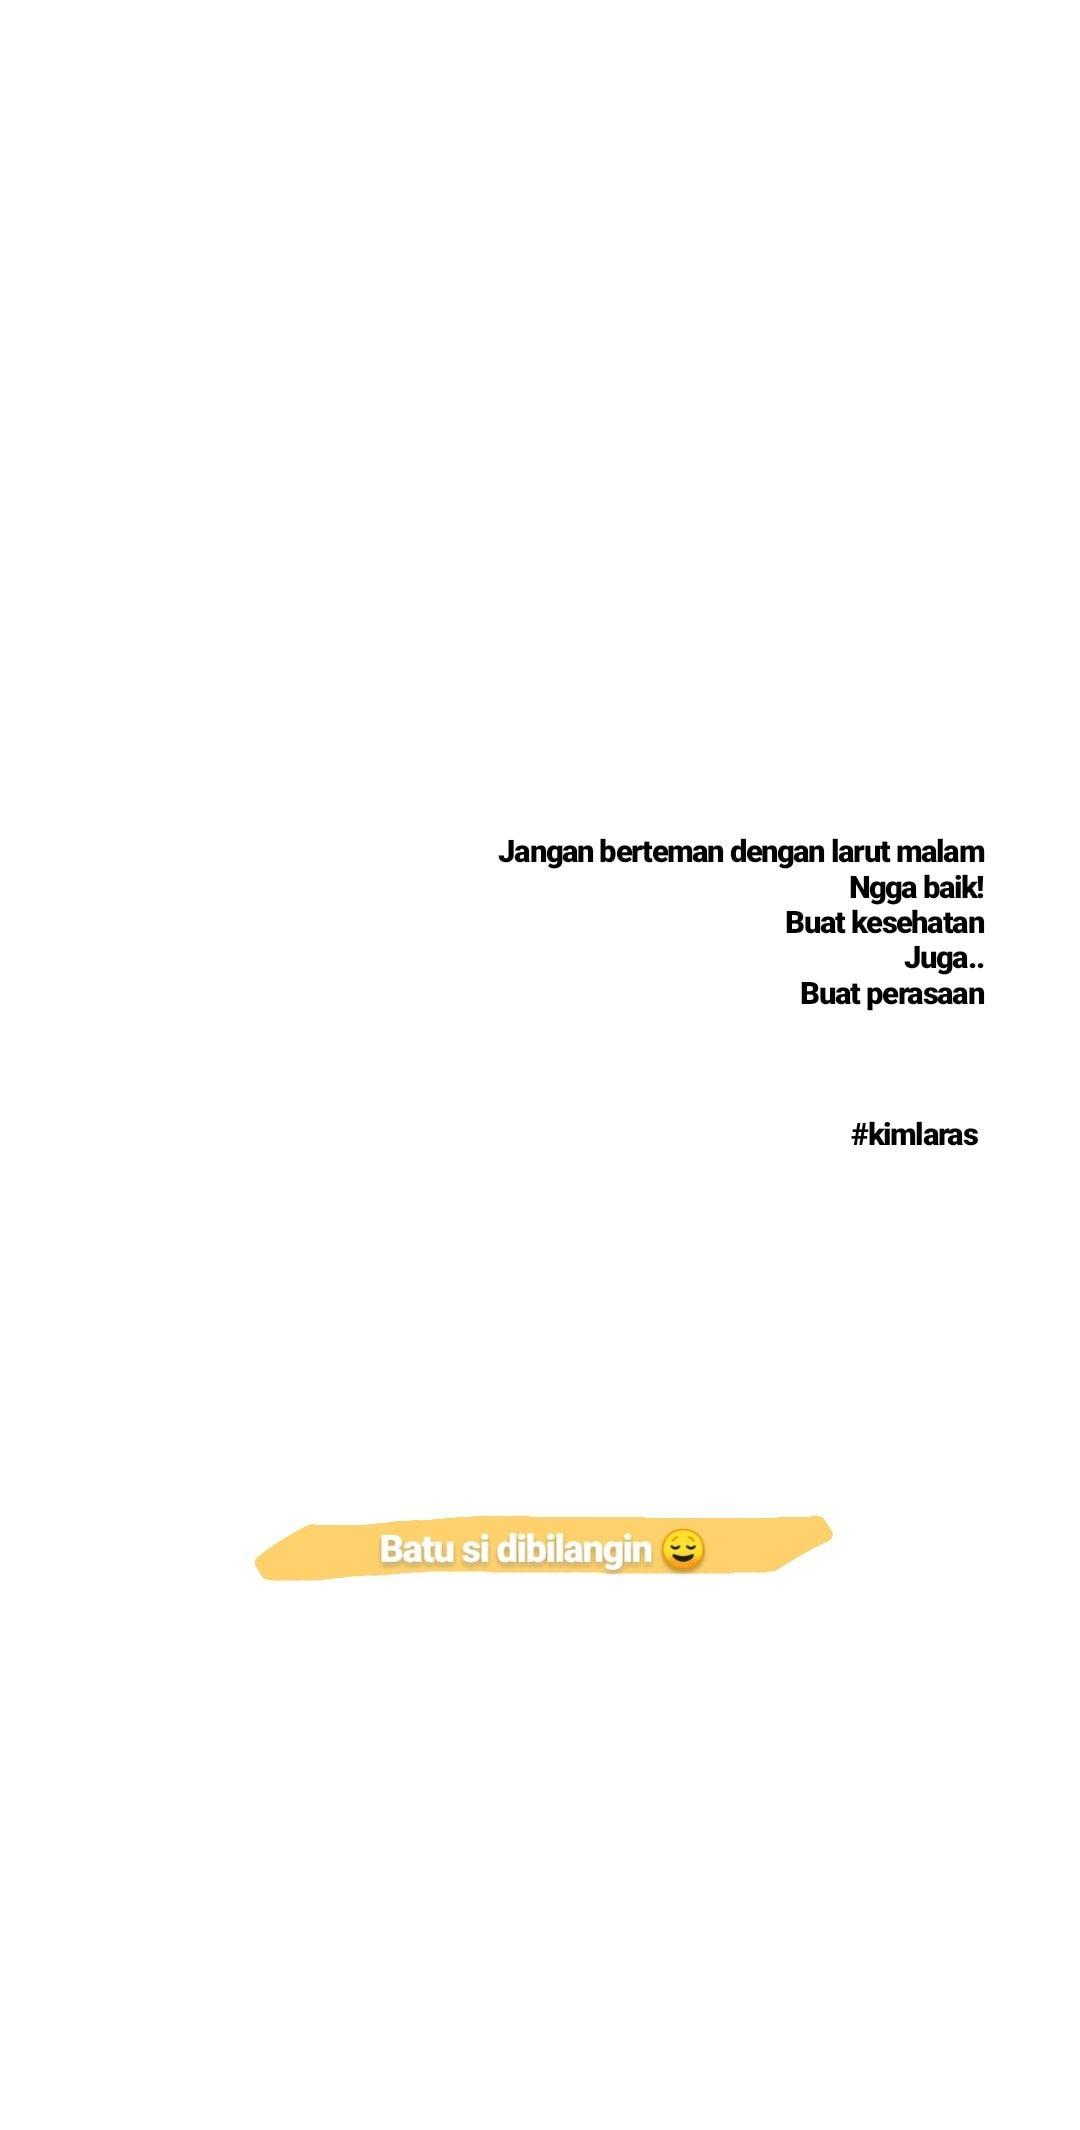 Pin Oleh Ivaa Di Kutipan Quotes Bahasa Indonesia Ig Kimlaras 22 Kutipan Perasaan Pengetahuan